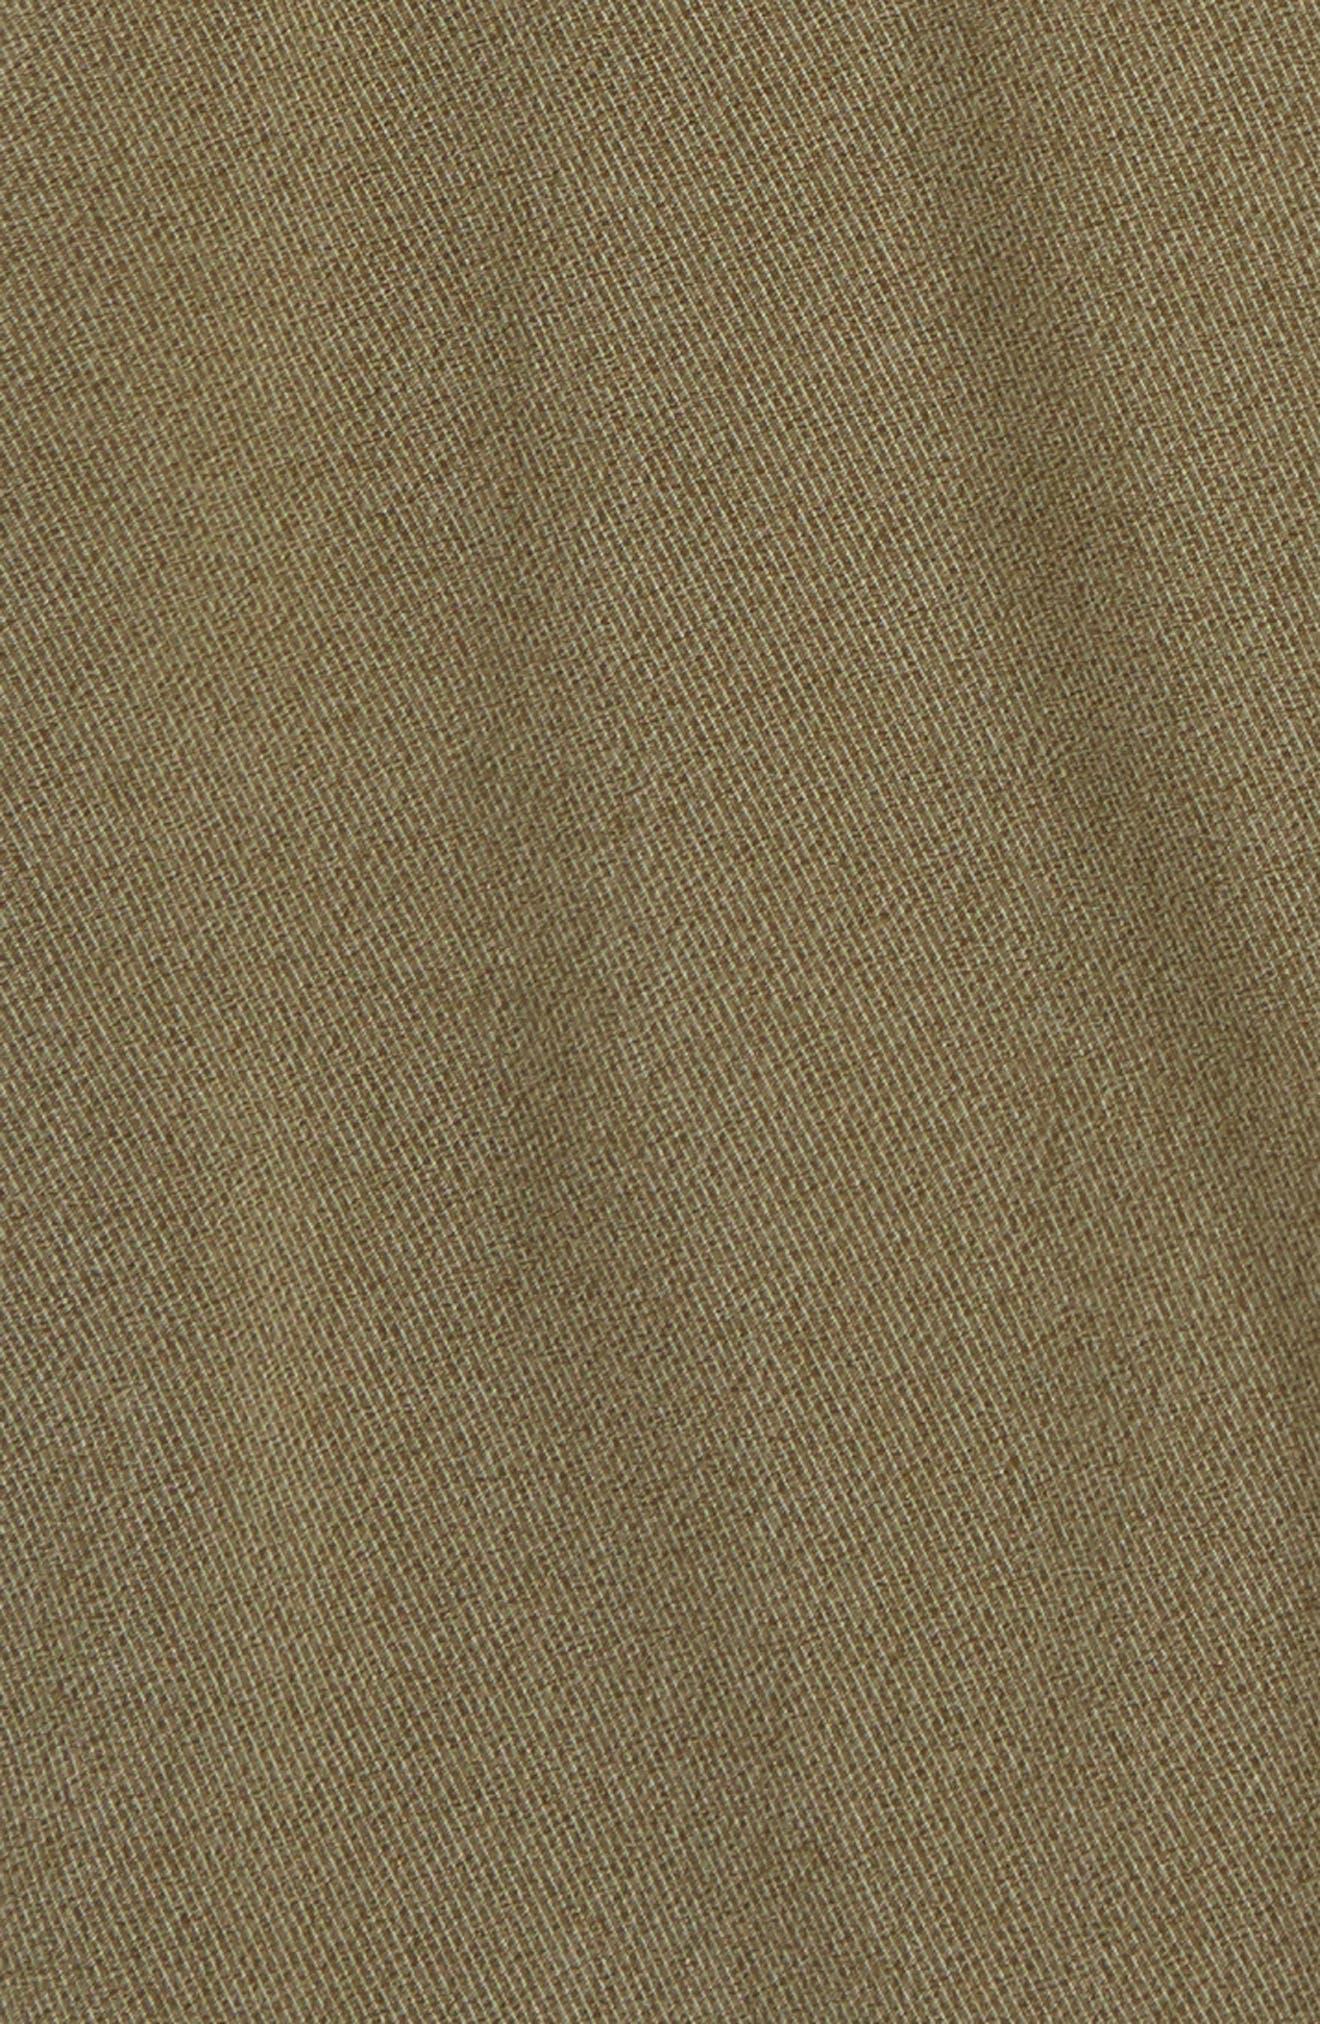 Stockton Hybrid Shorts,                             Alternate thumbnail 2, color,                             MILITARY GREEN